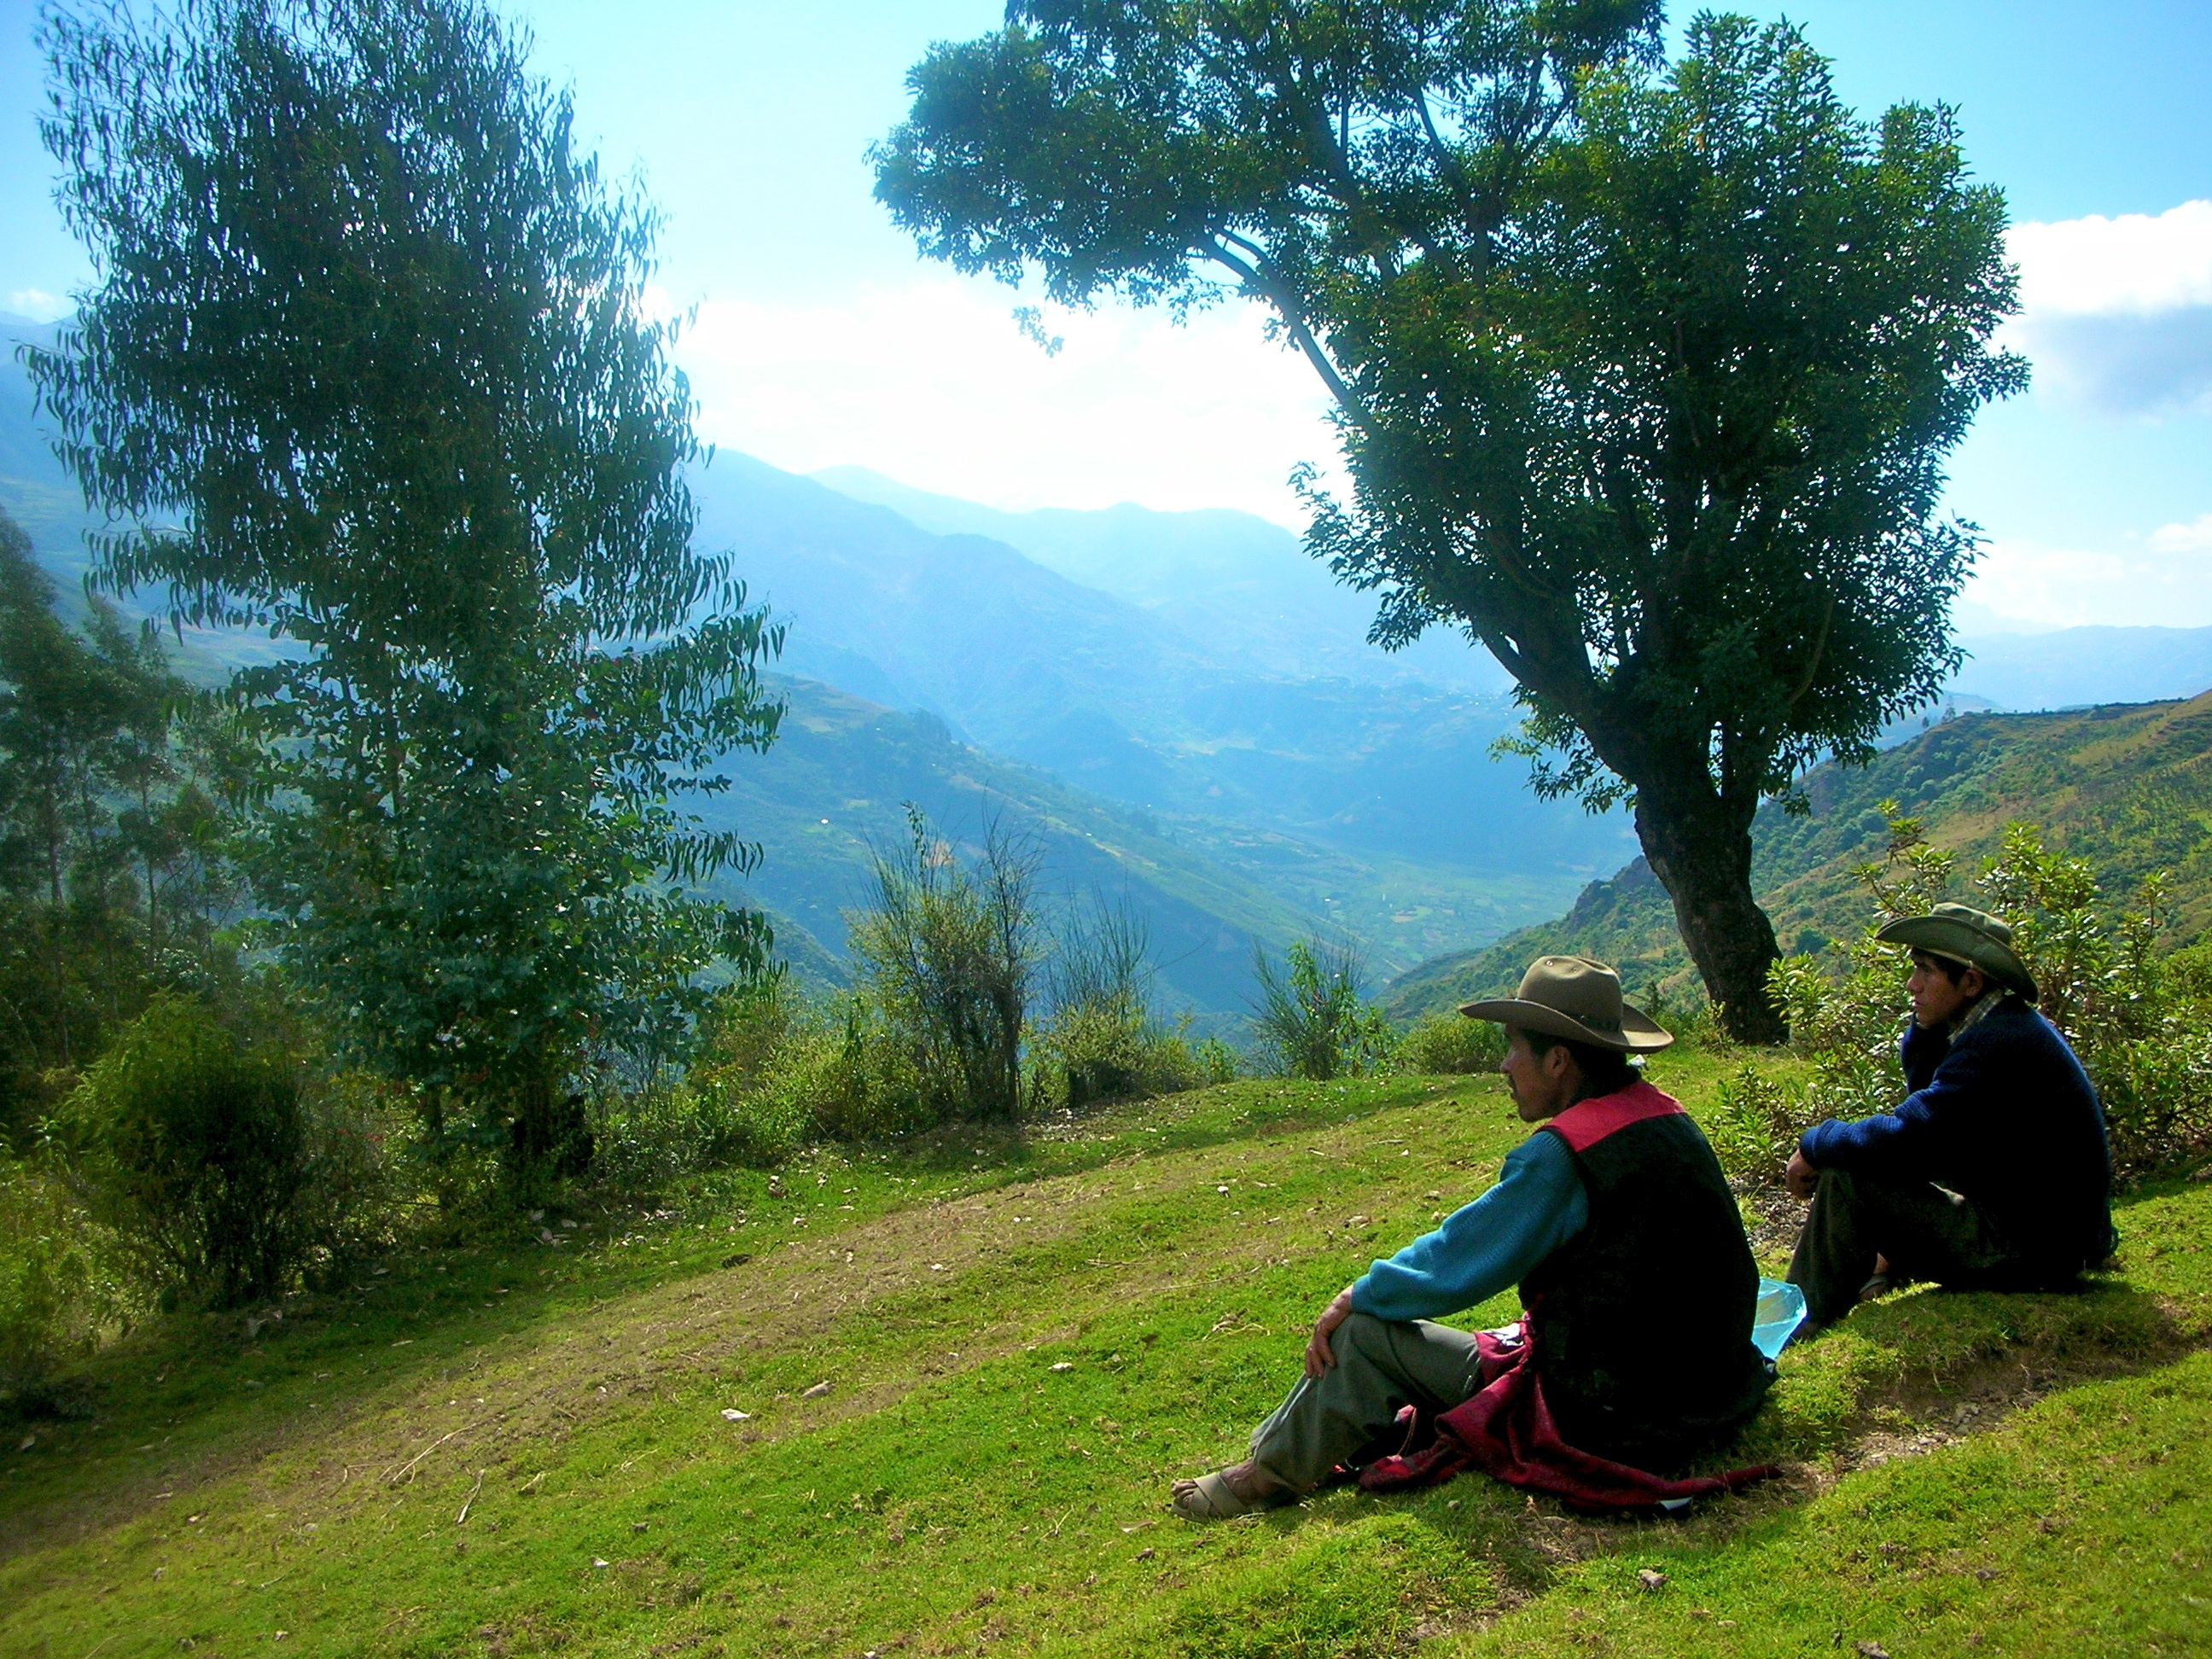 Taken with Nikon S1 (Peru: 2006)